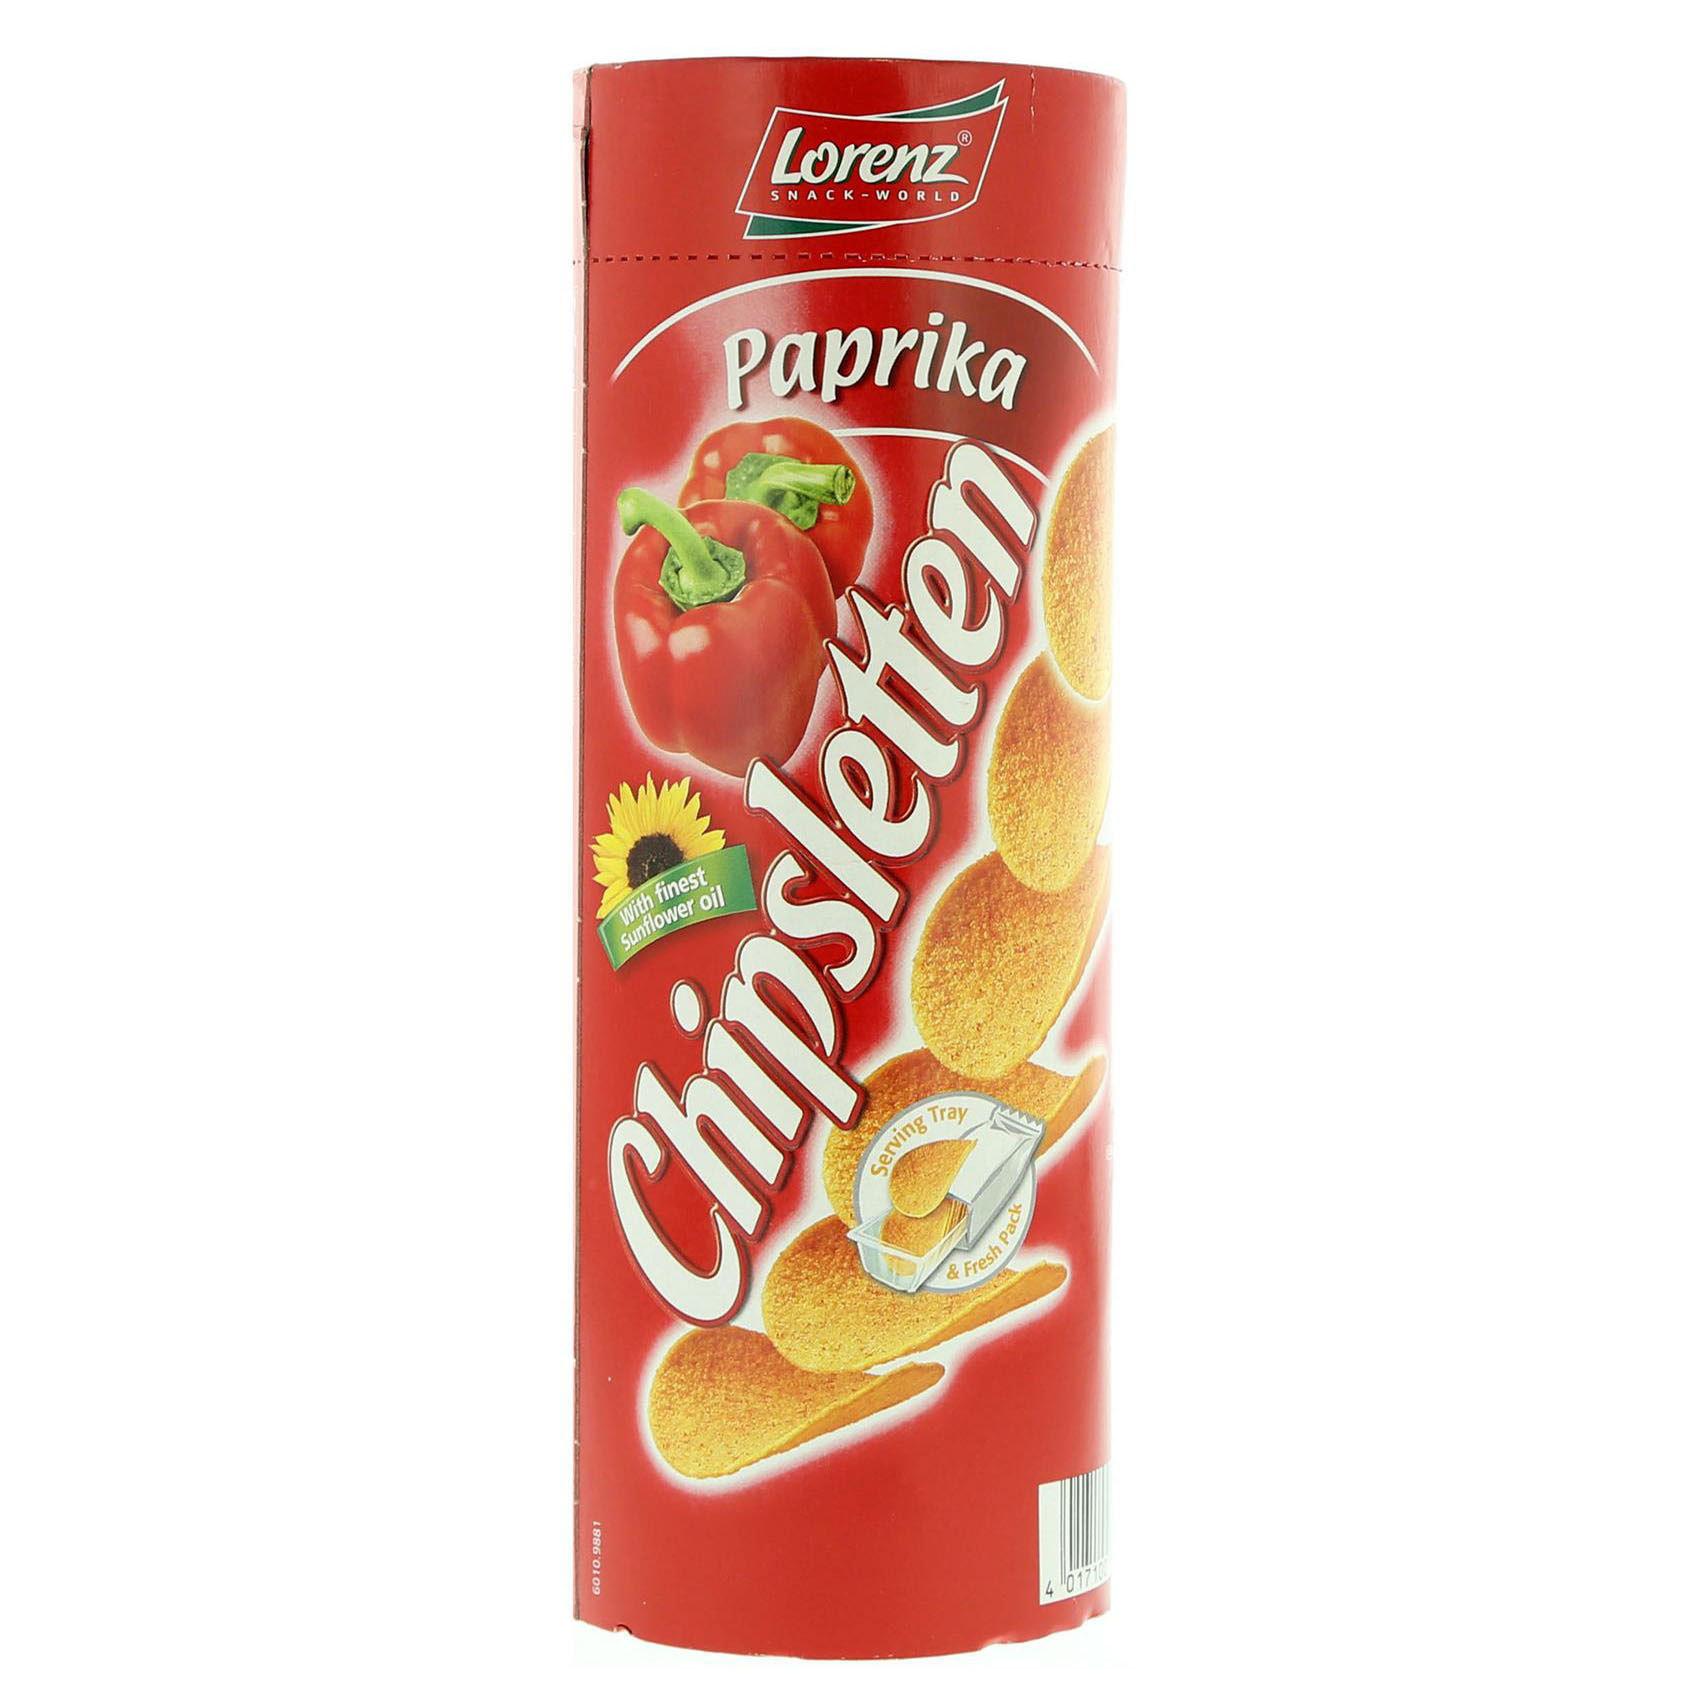 LORENZ CHIPSLETTEN PAPRIKA CL 100G